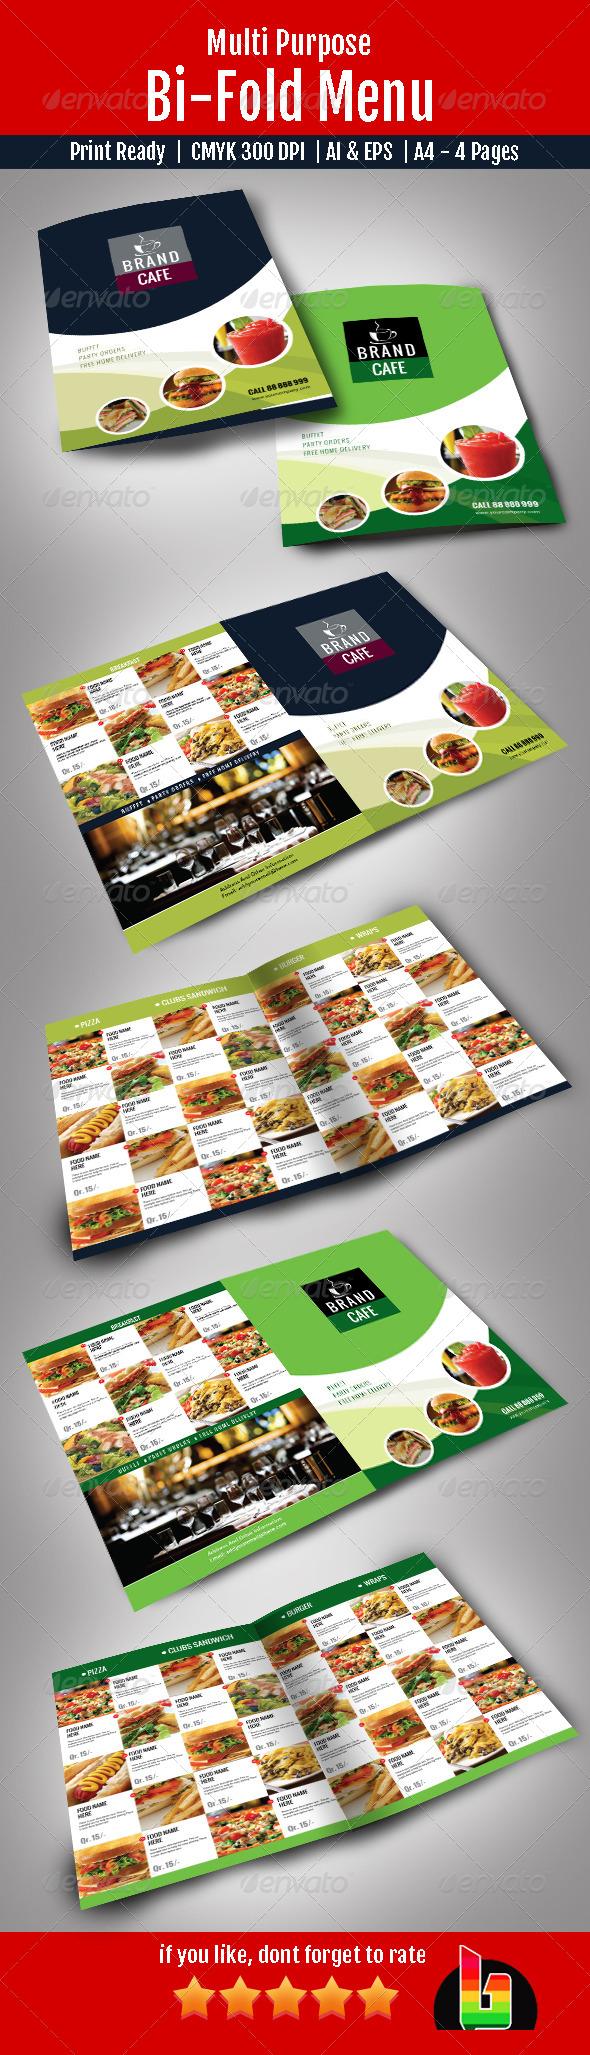 Bi-Fold Menu - Restaurant Flyers